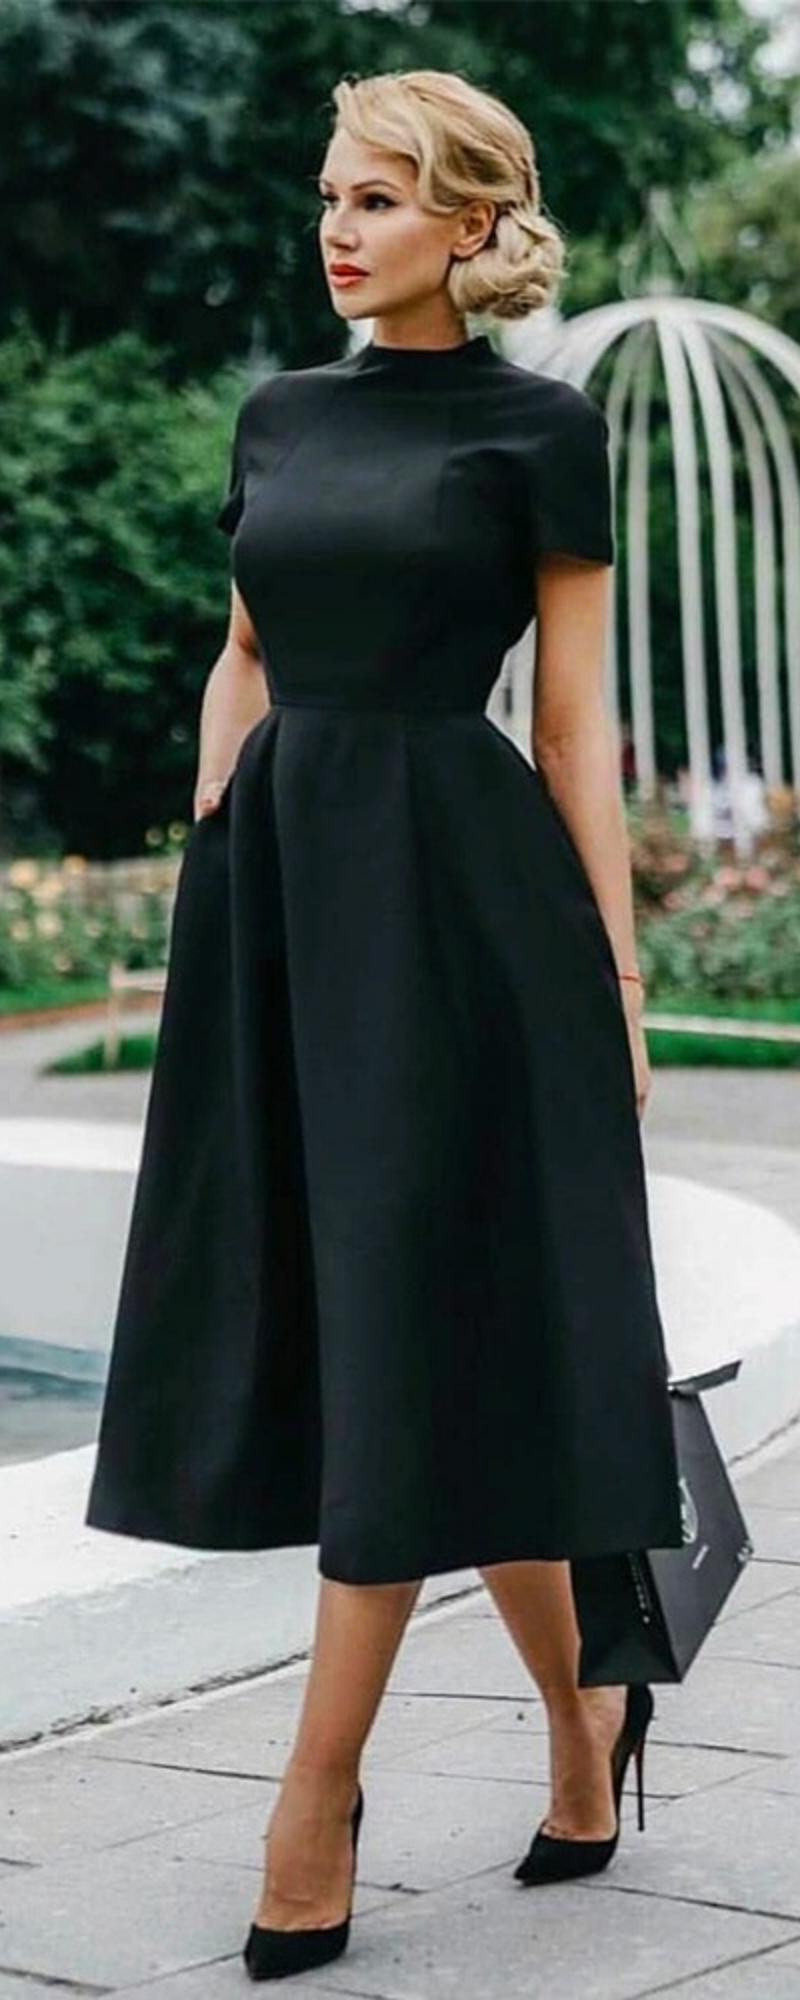 Black Vintage Flare Dress Runway Street Style Black Dresses Classy Classy Dress Fashion Dresses [ 2000 x 800 Pixel ]